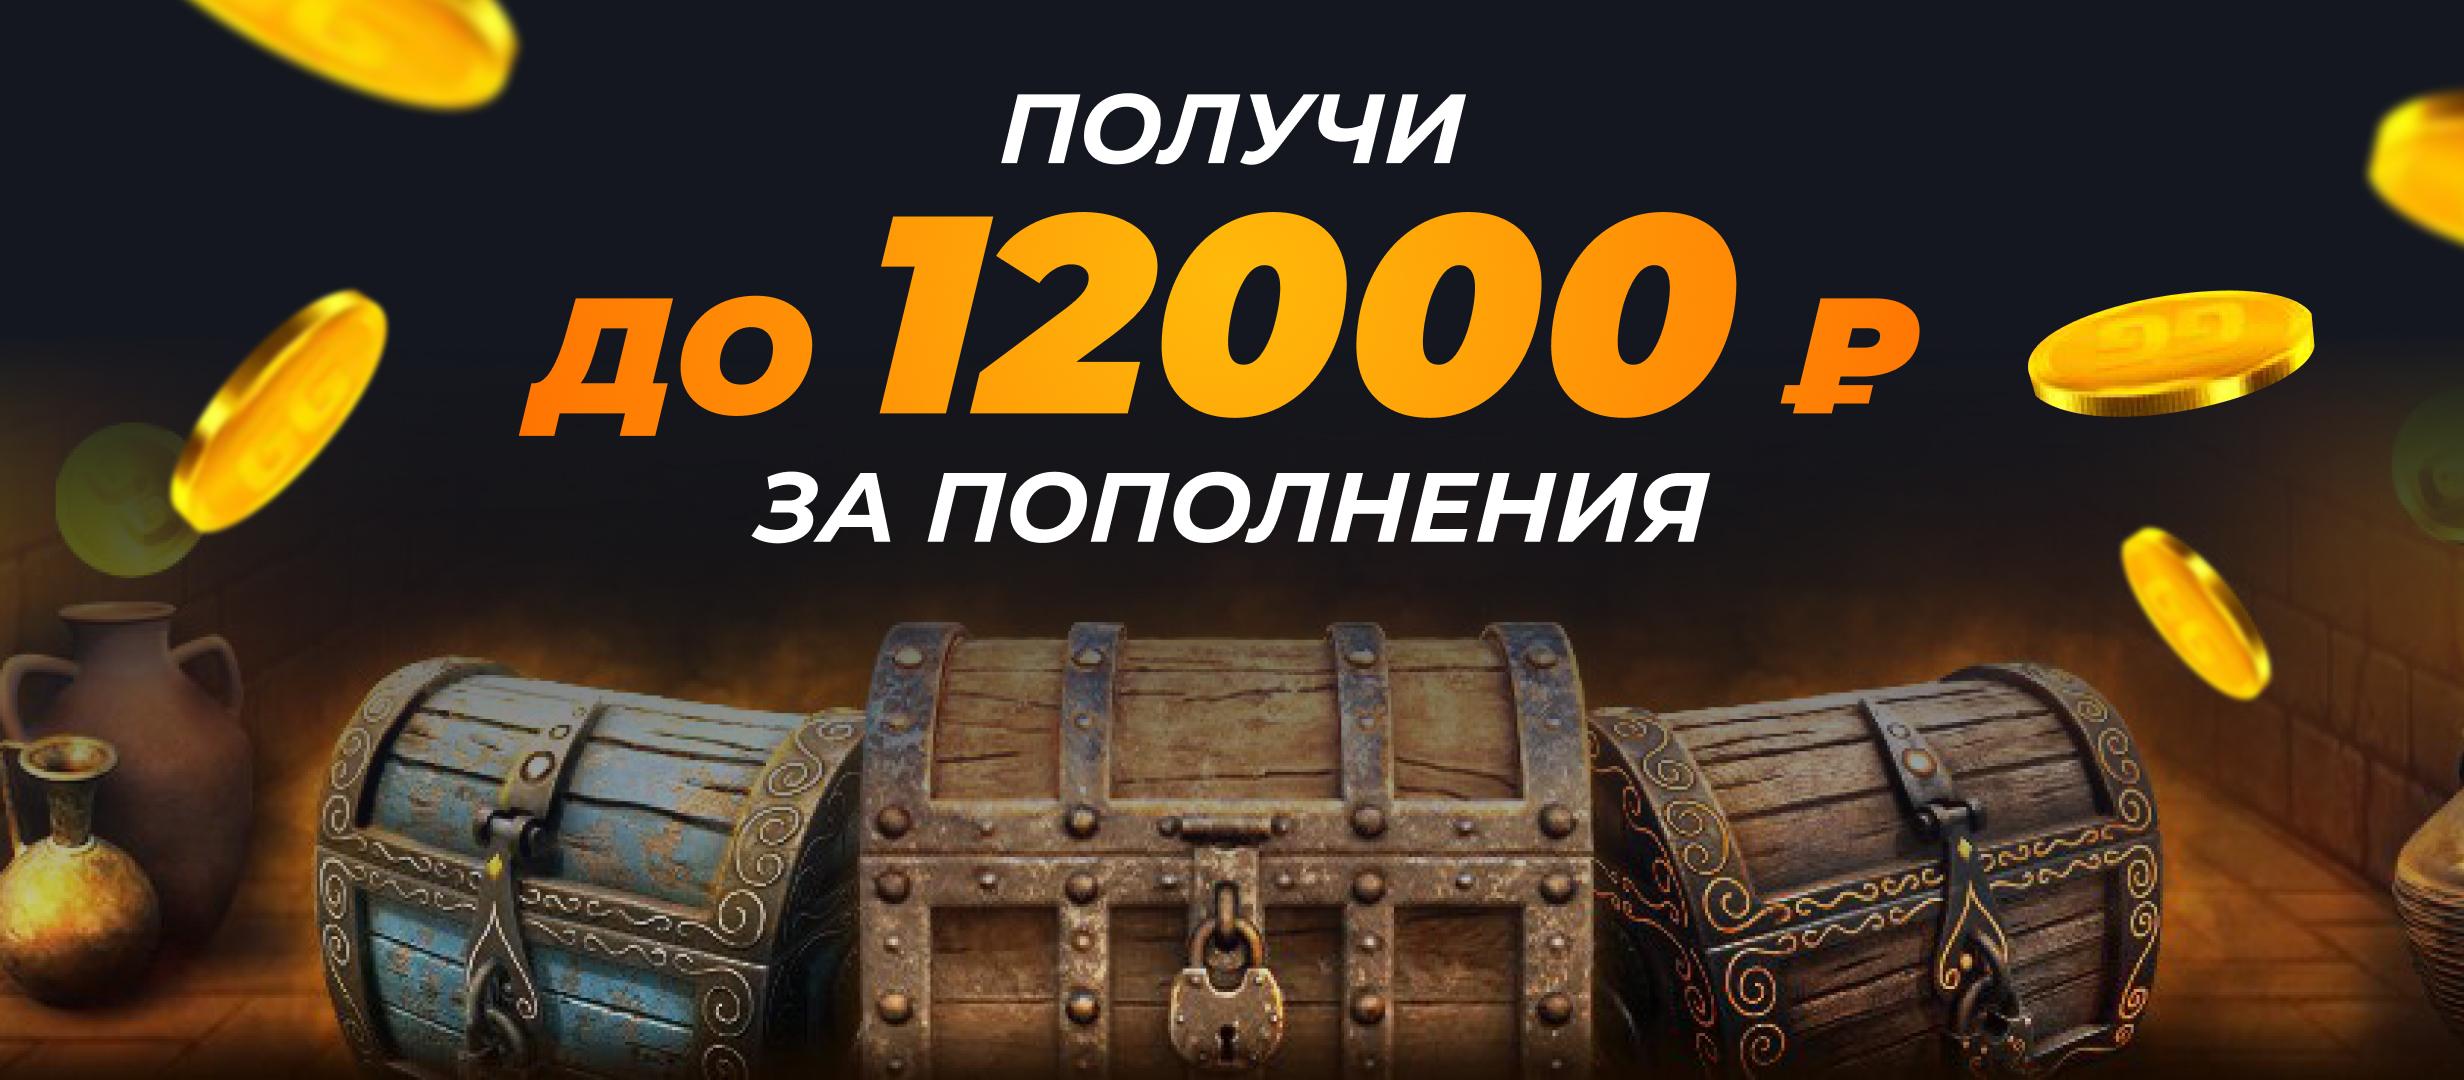 Кеш-бонус от GGBET 33000 ₽.